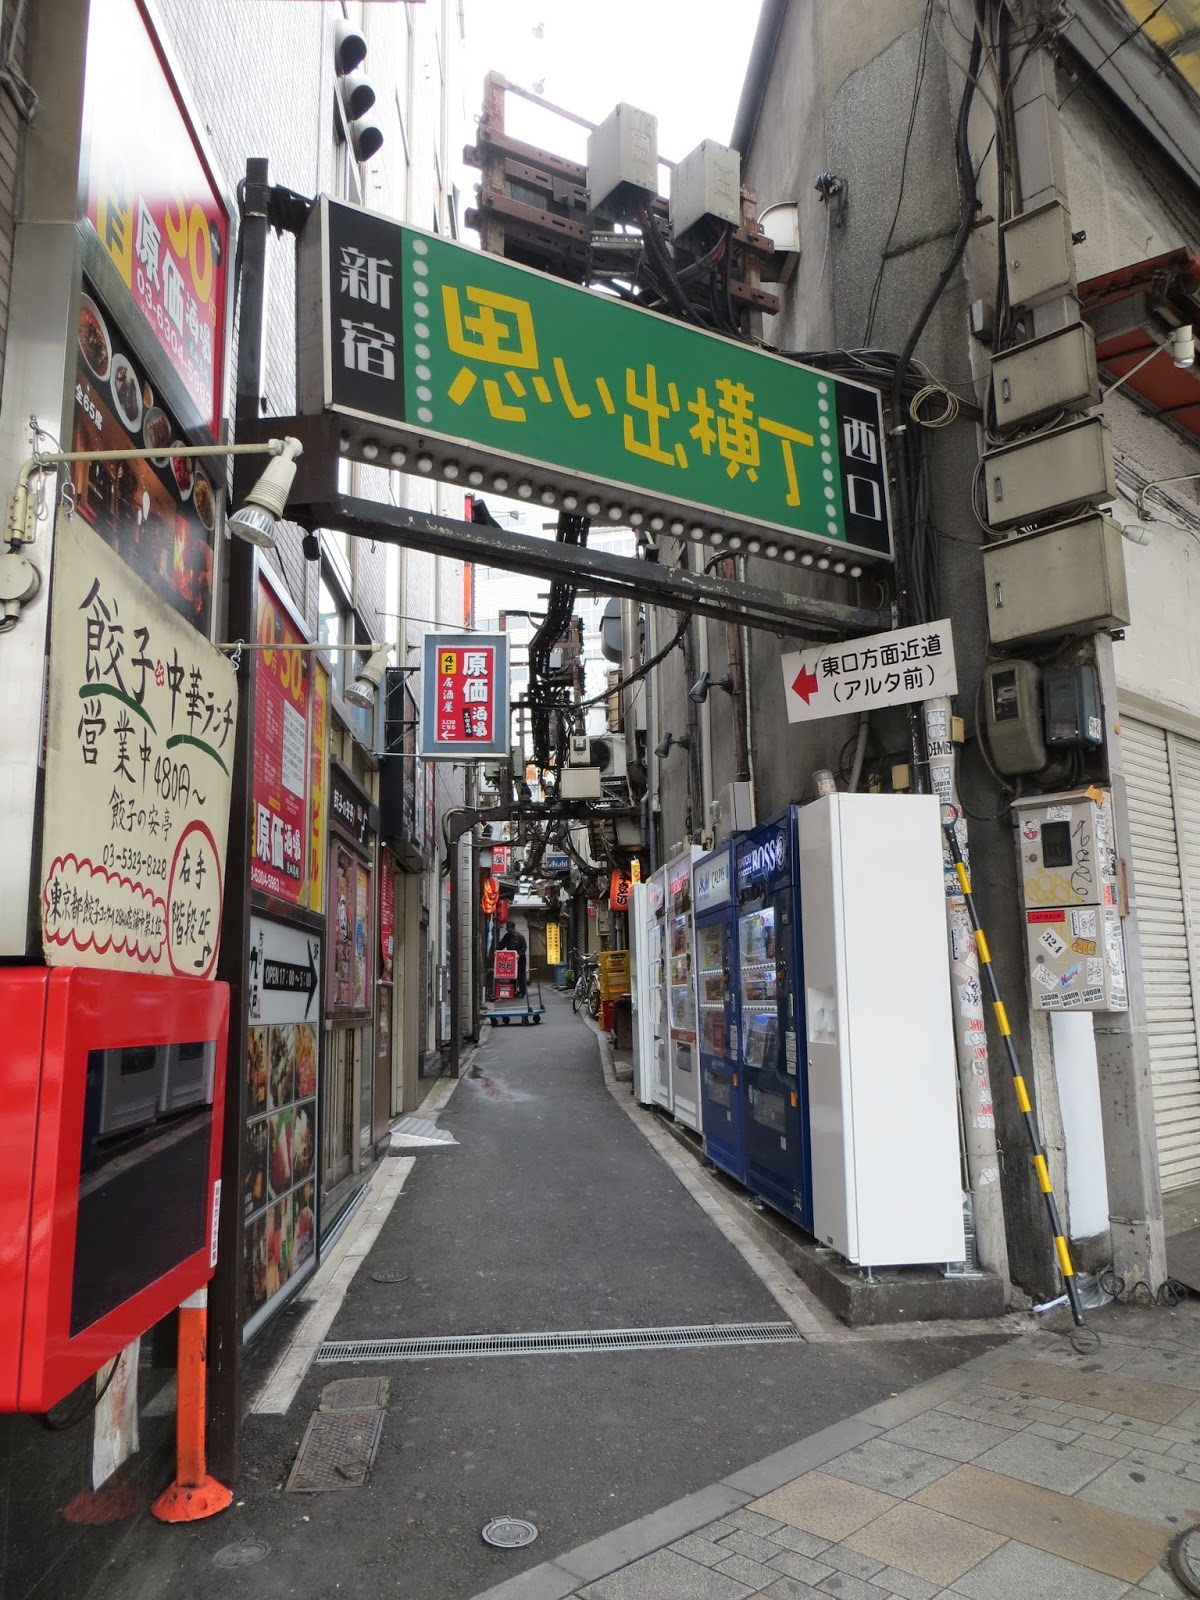 Alley way tokyo, streets japan, vending machines, must do tokyo, Japan